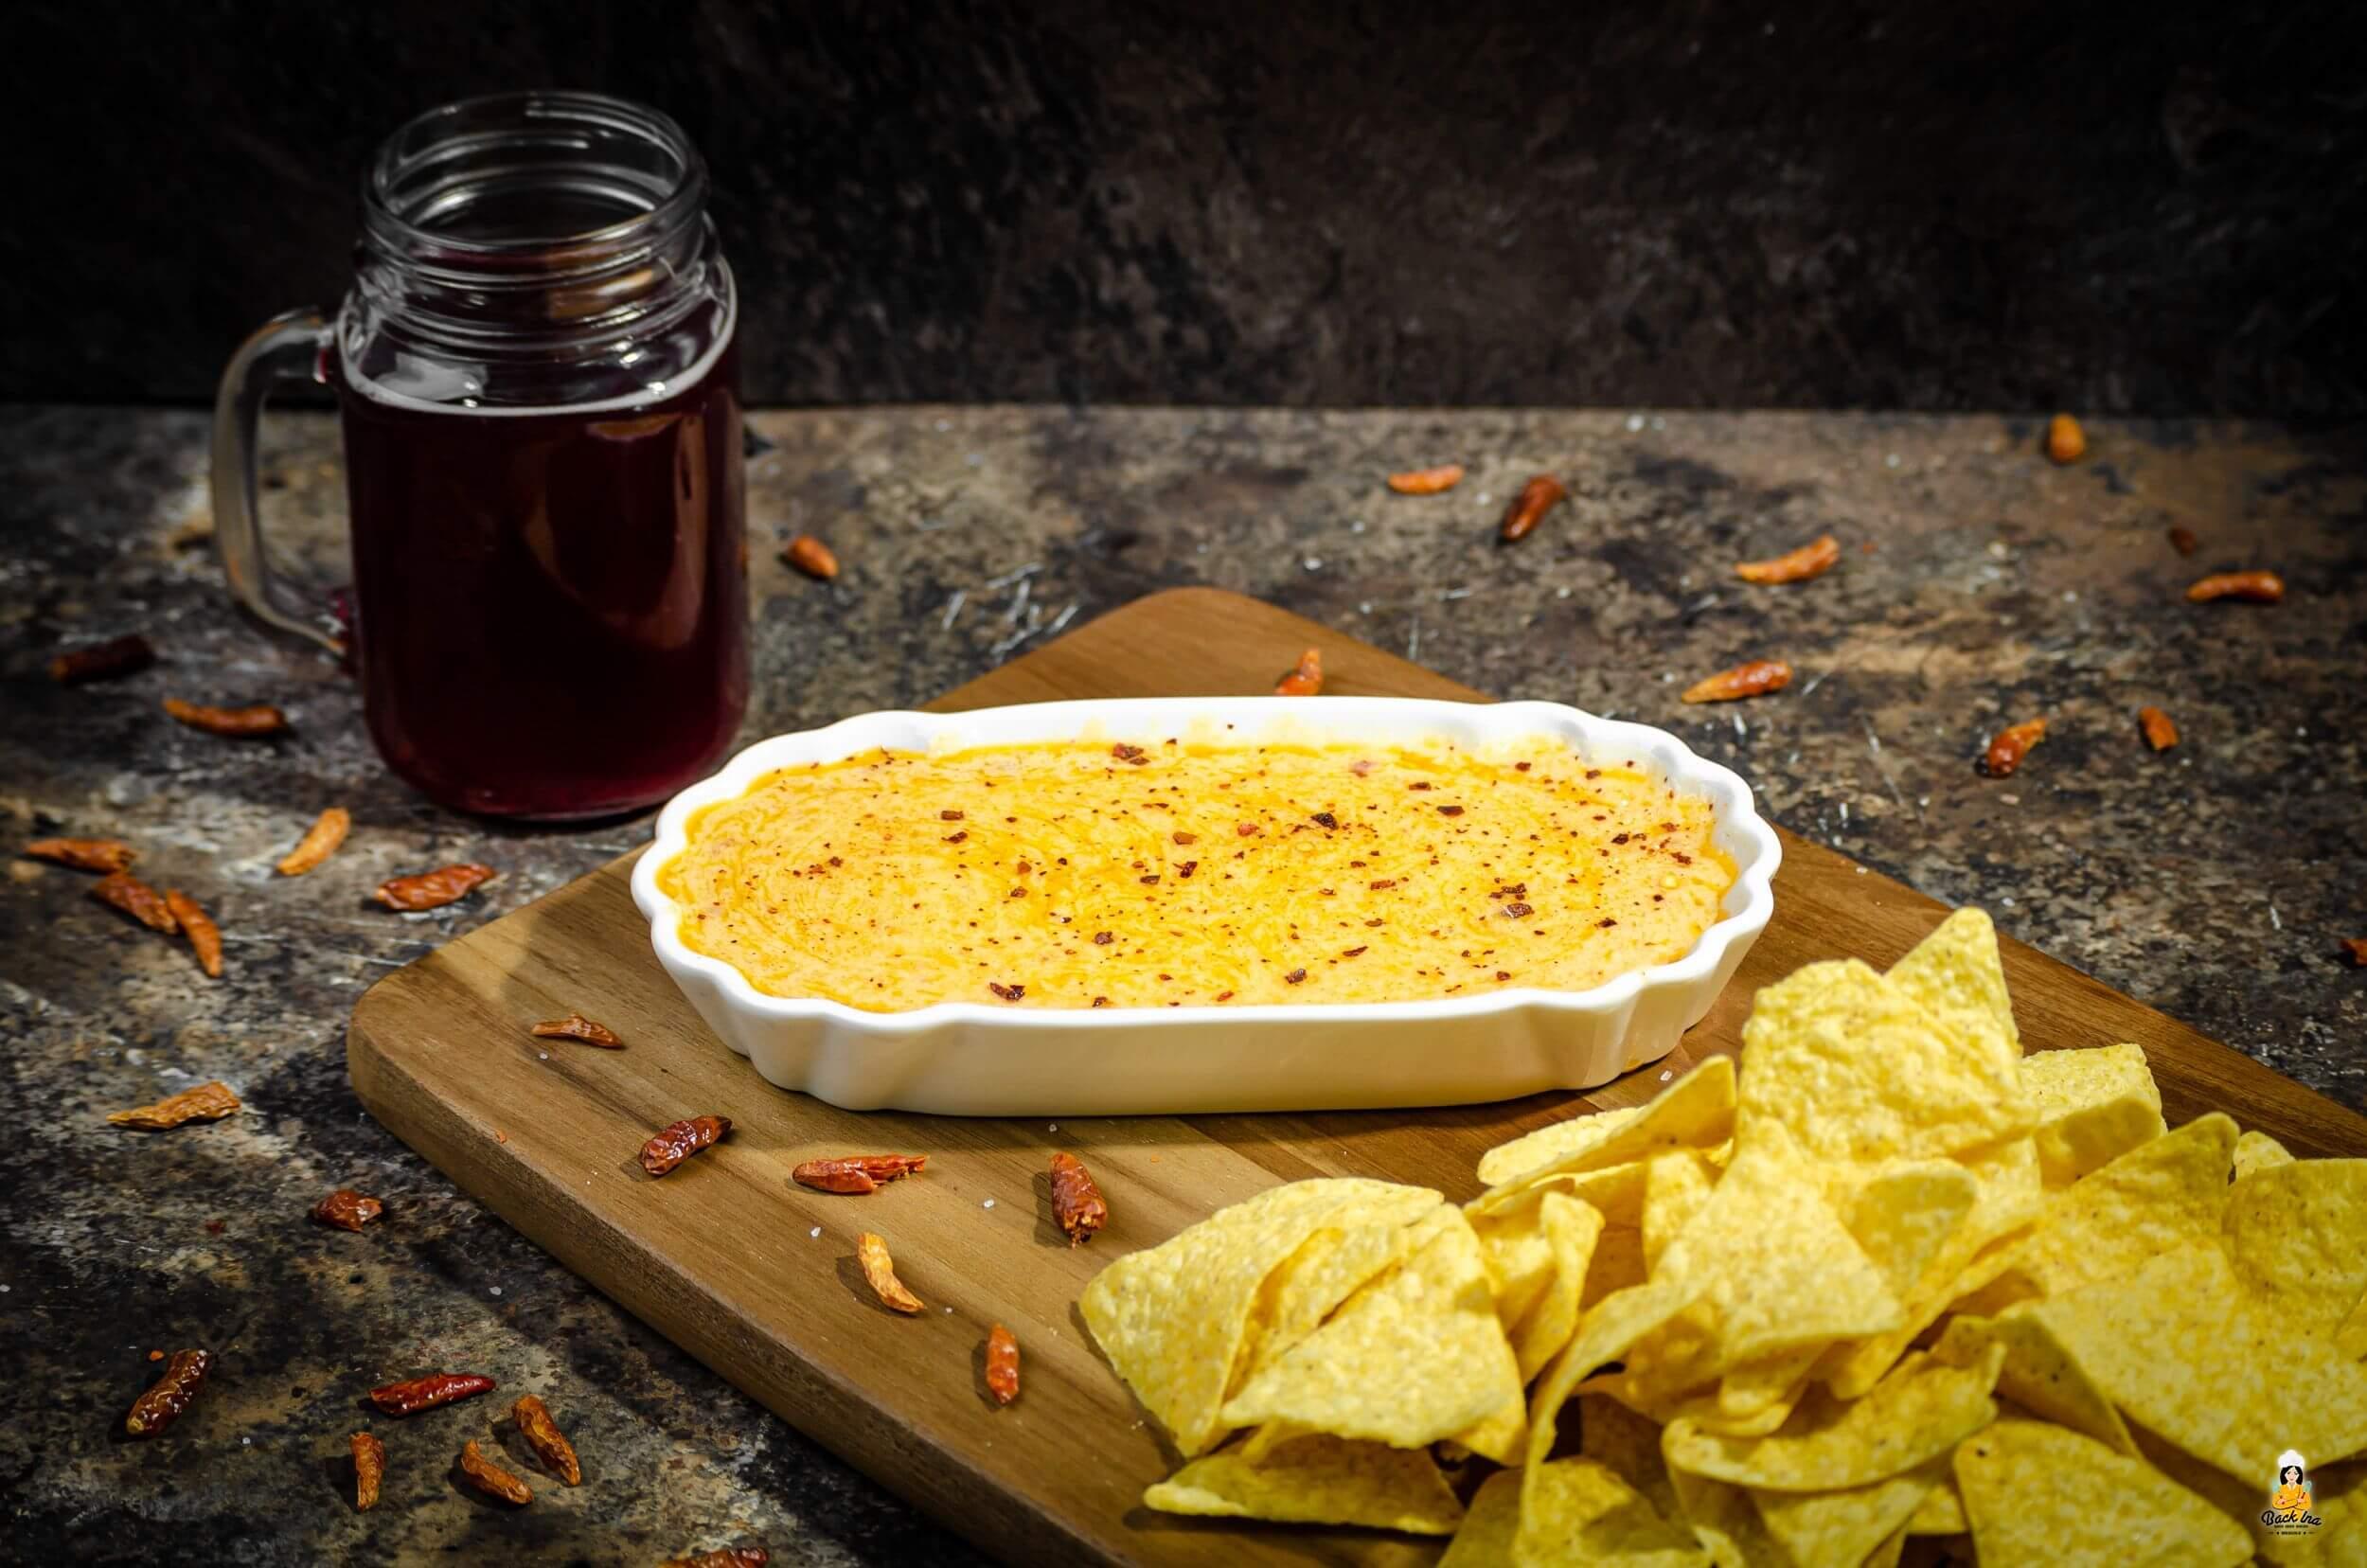 Spicy Käsesauce zum Dippen selber machen | BackIna